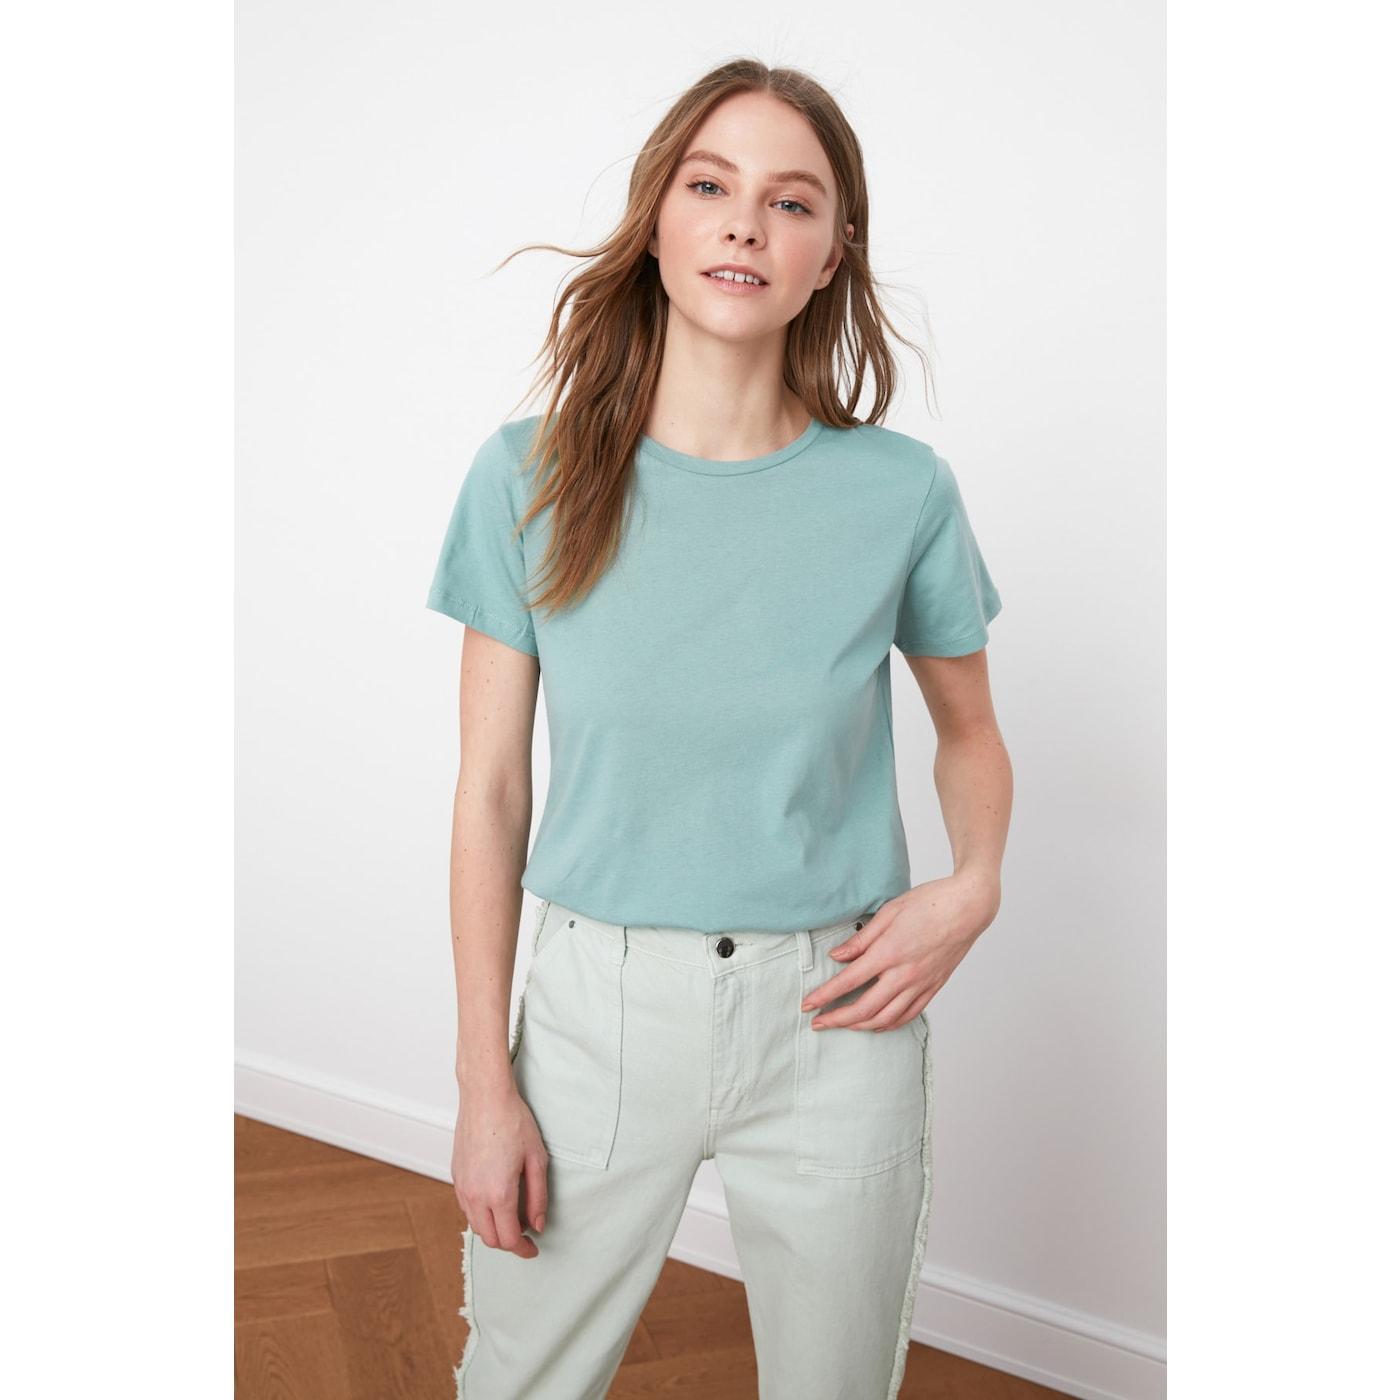 Trendyol Mint 100% Cotton Süprem Bicycle Collar Basic Knitted T-Shirt dámské XS